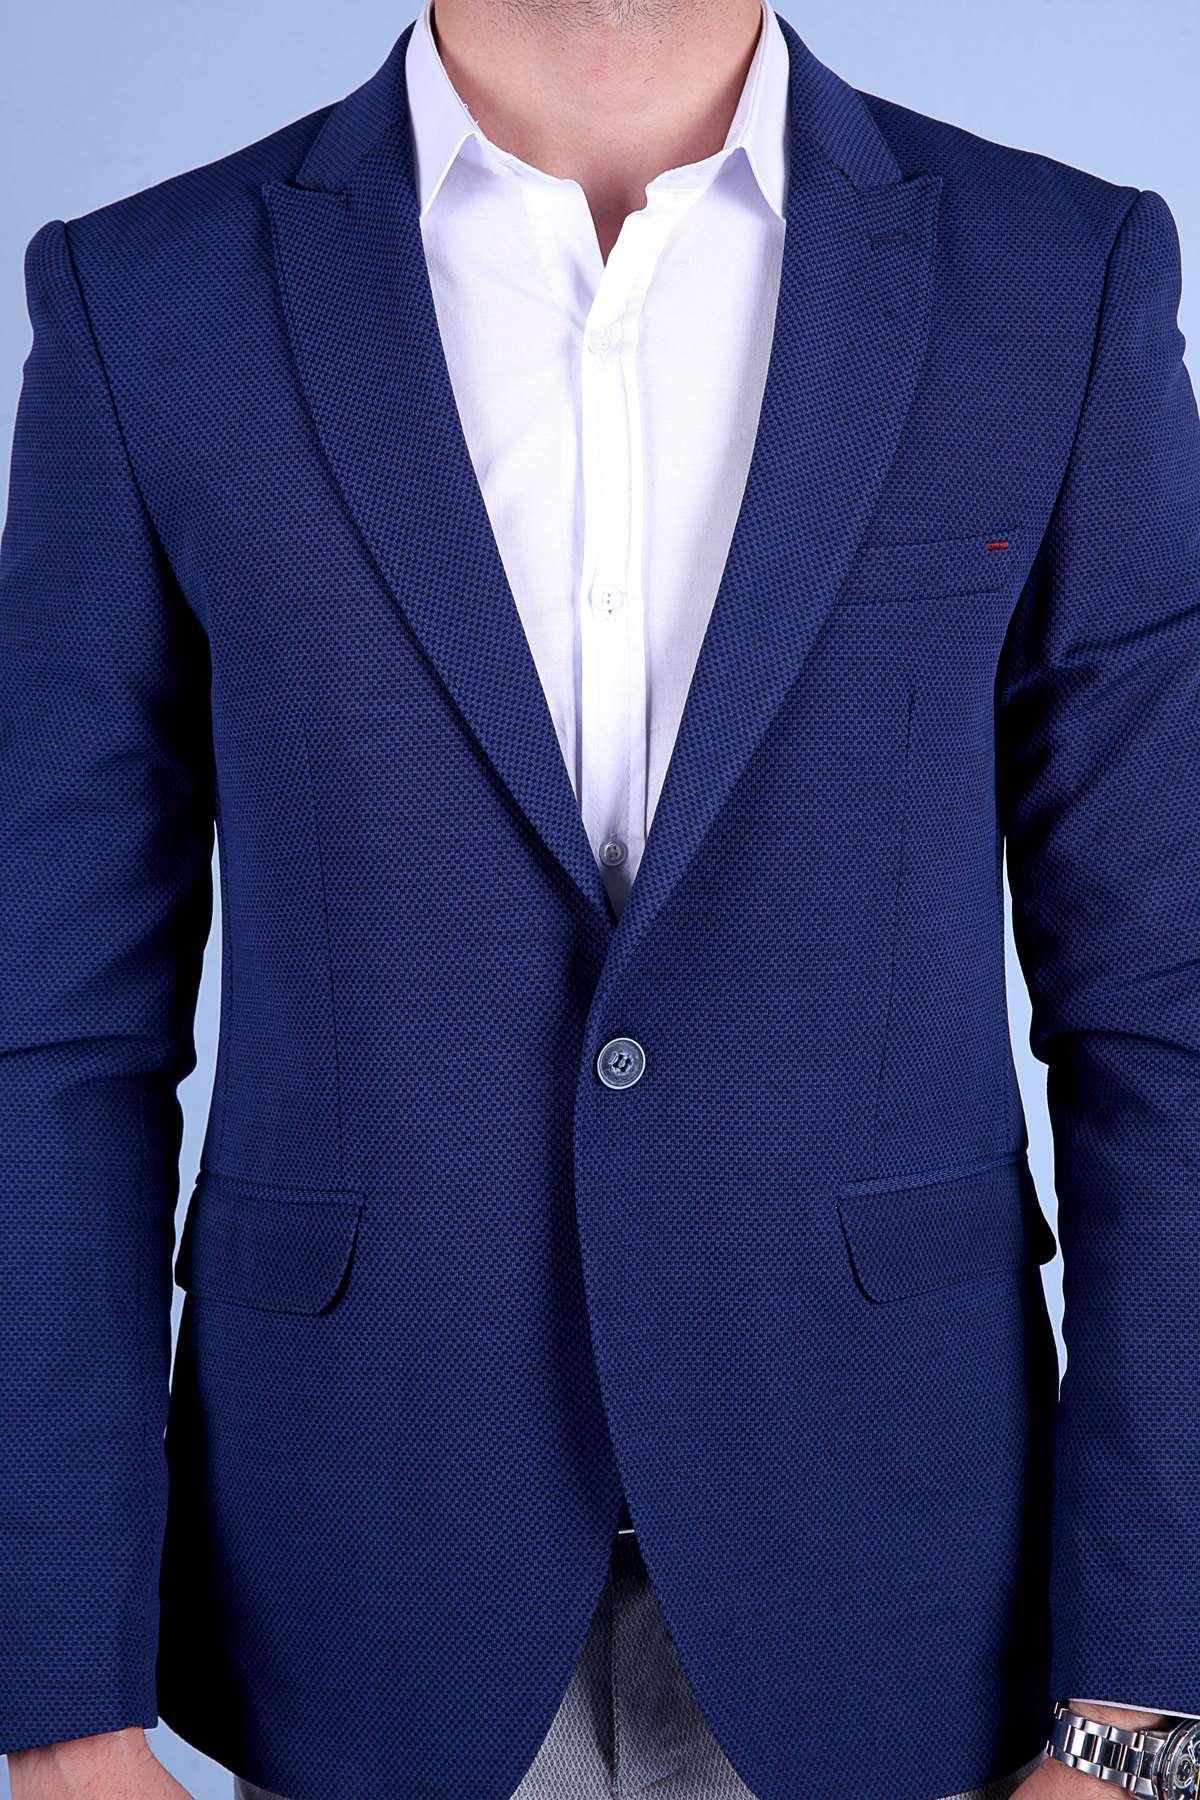 Küçük Kare Desenli Slim Fit Blazer Ceket Lacivert